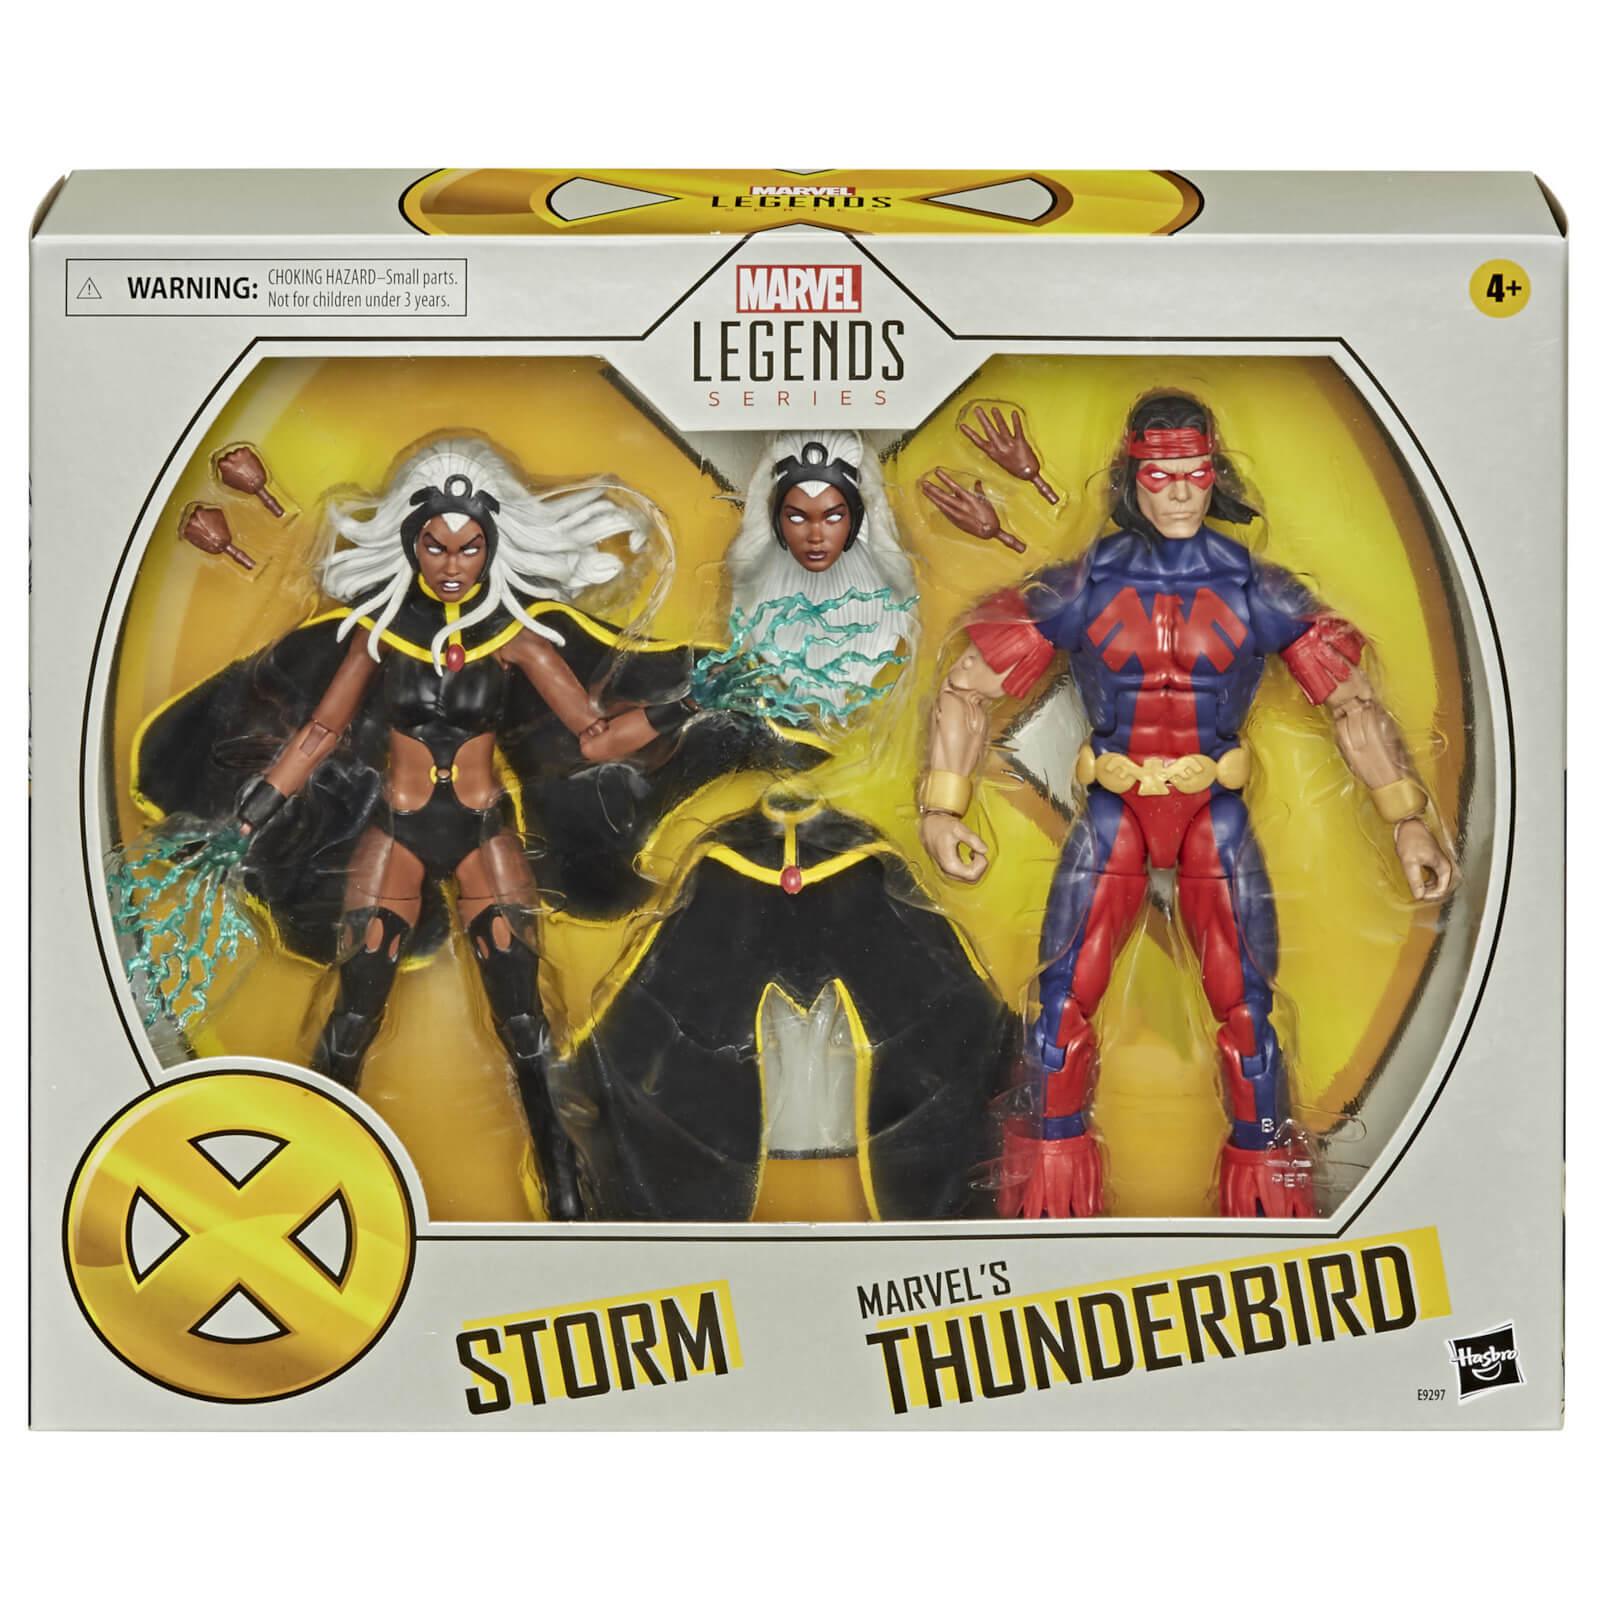 Image of Hasbro Marvel Legends X-Men Storm & Thunderbird 2-Pack Action Figure